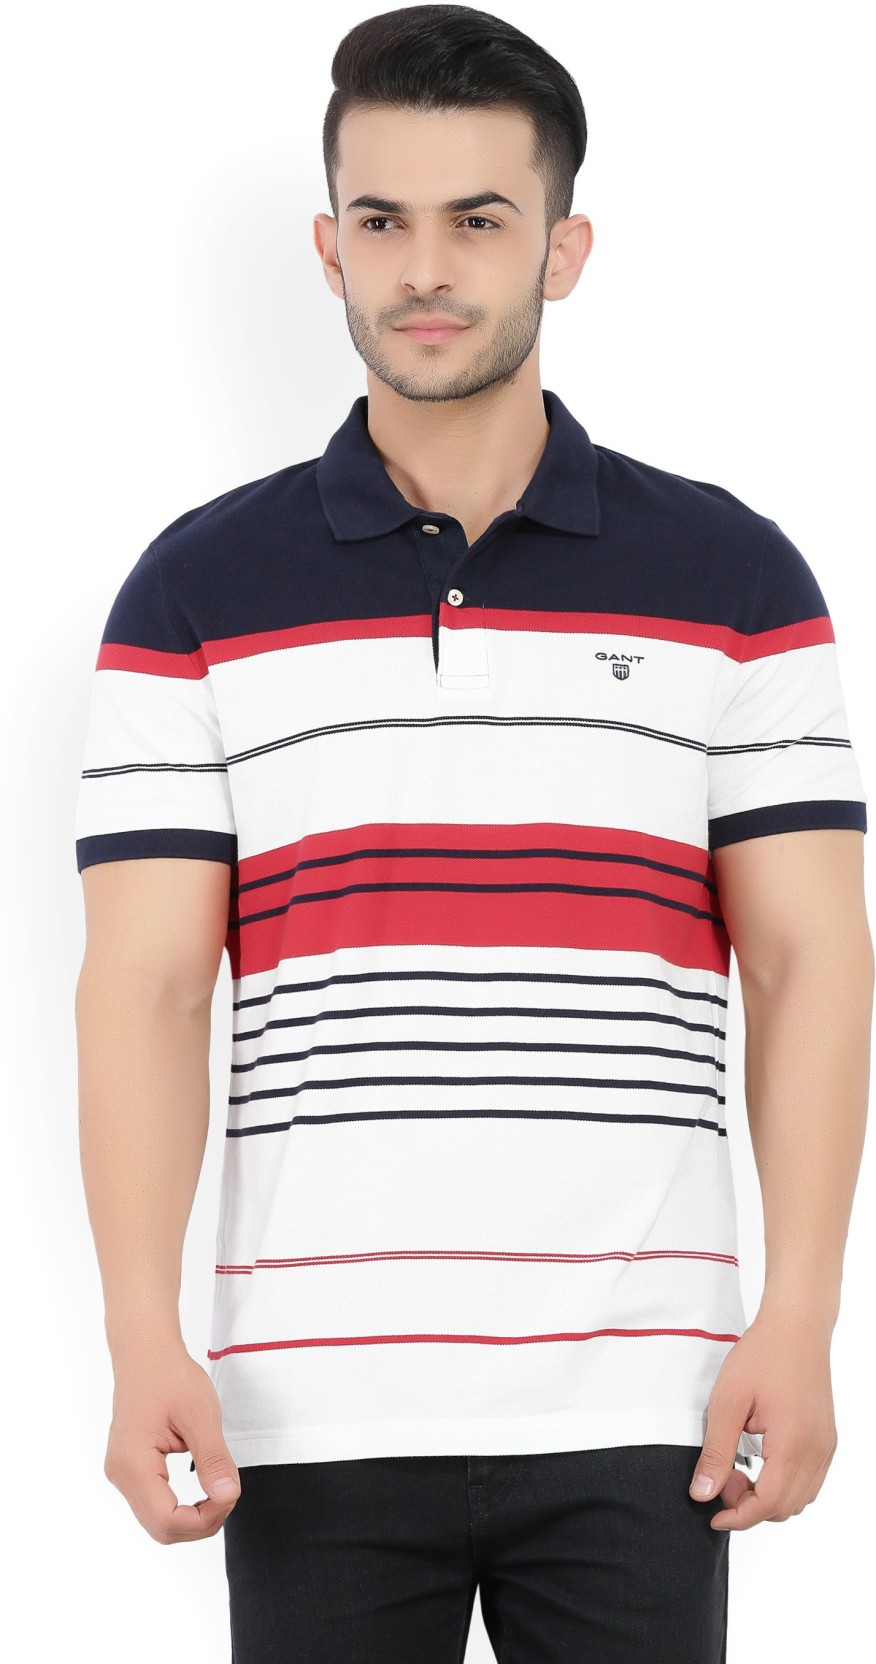 f1be0234 Gant Shirts Sale India - DREAMWORKS